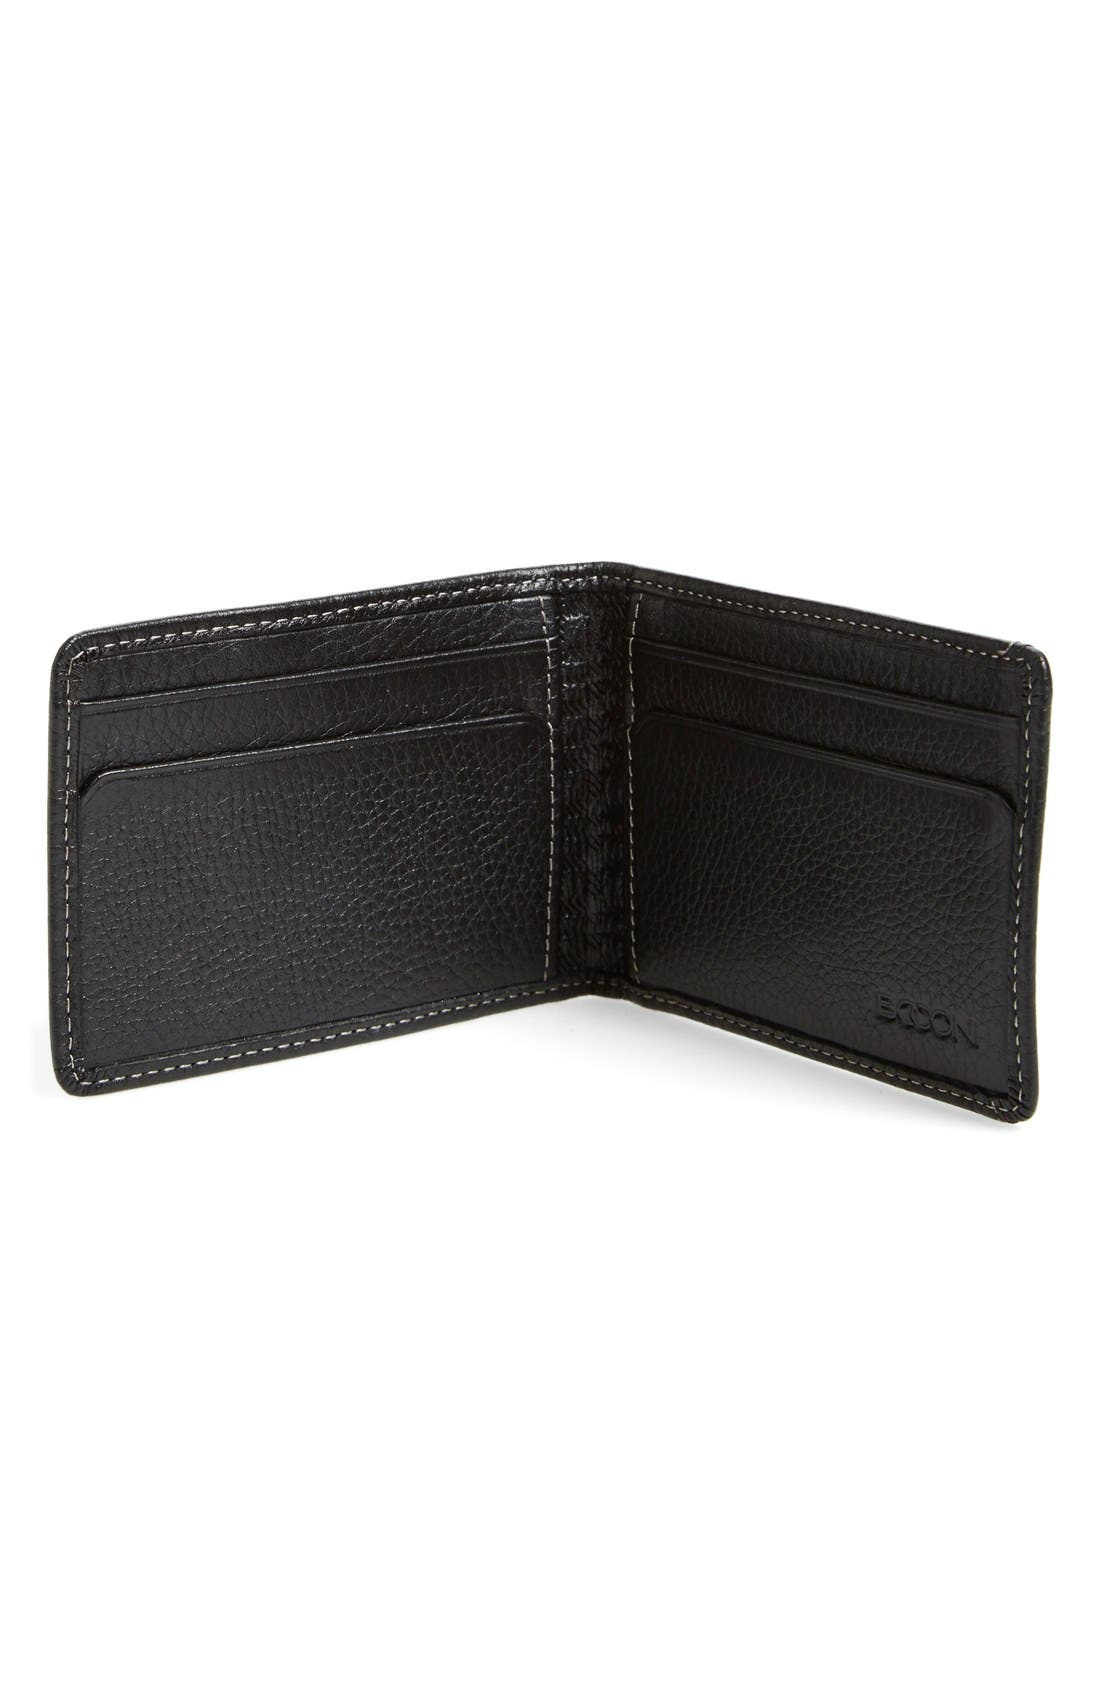 'Tyler' Money Clip Wallet,                             Alternate thumbnail 6, color,                             001